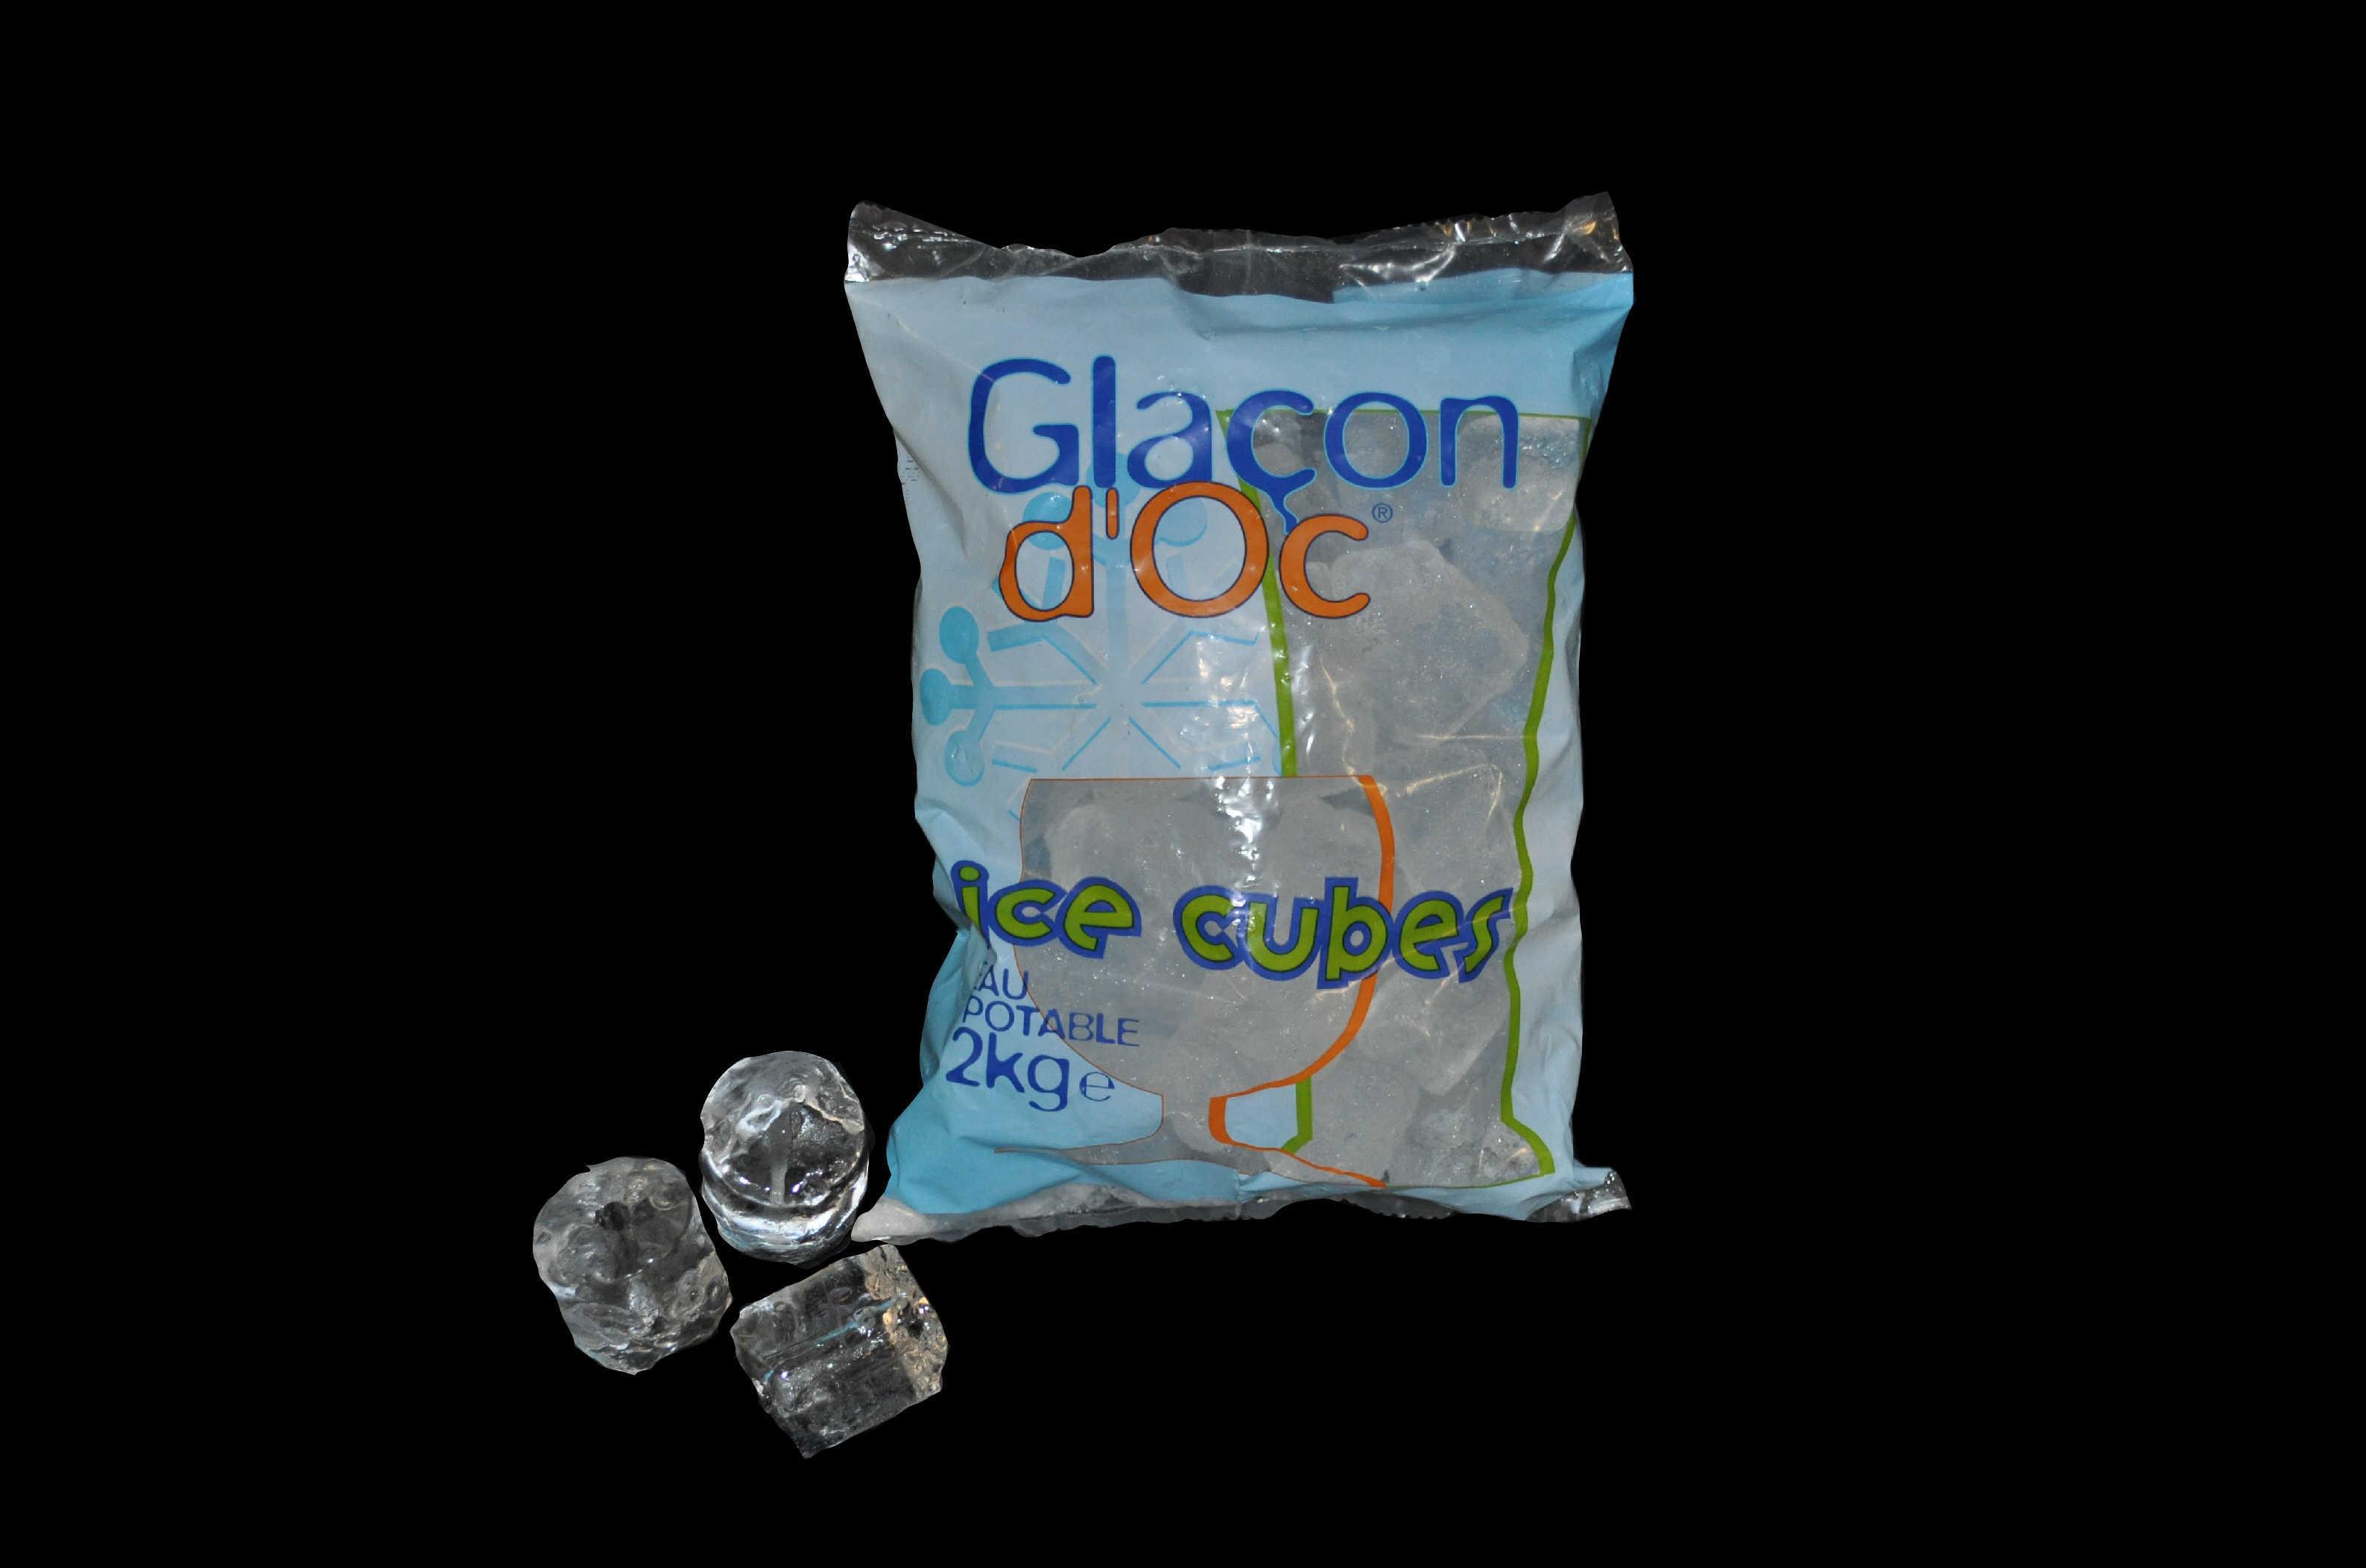 Gla ons d 39 oc glaci re narbonnaise - Sac glacons 20 kg ...